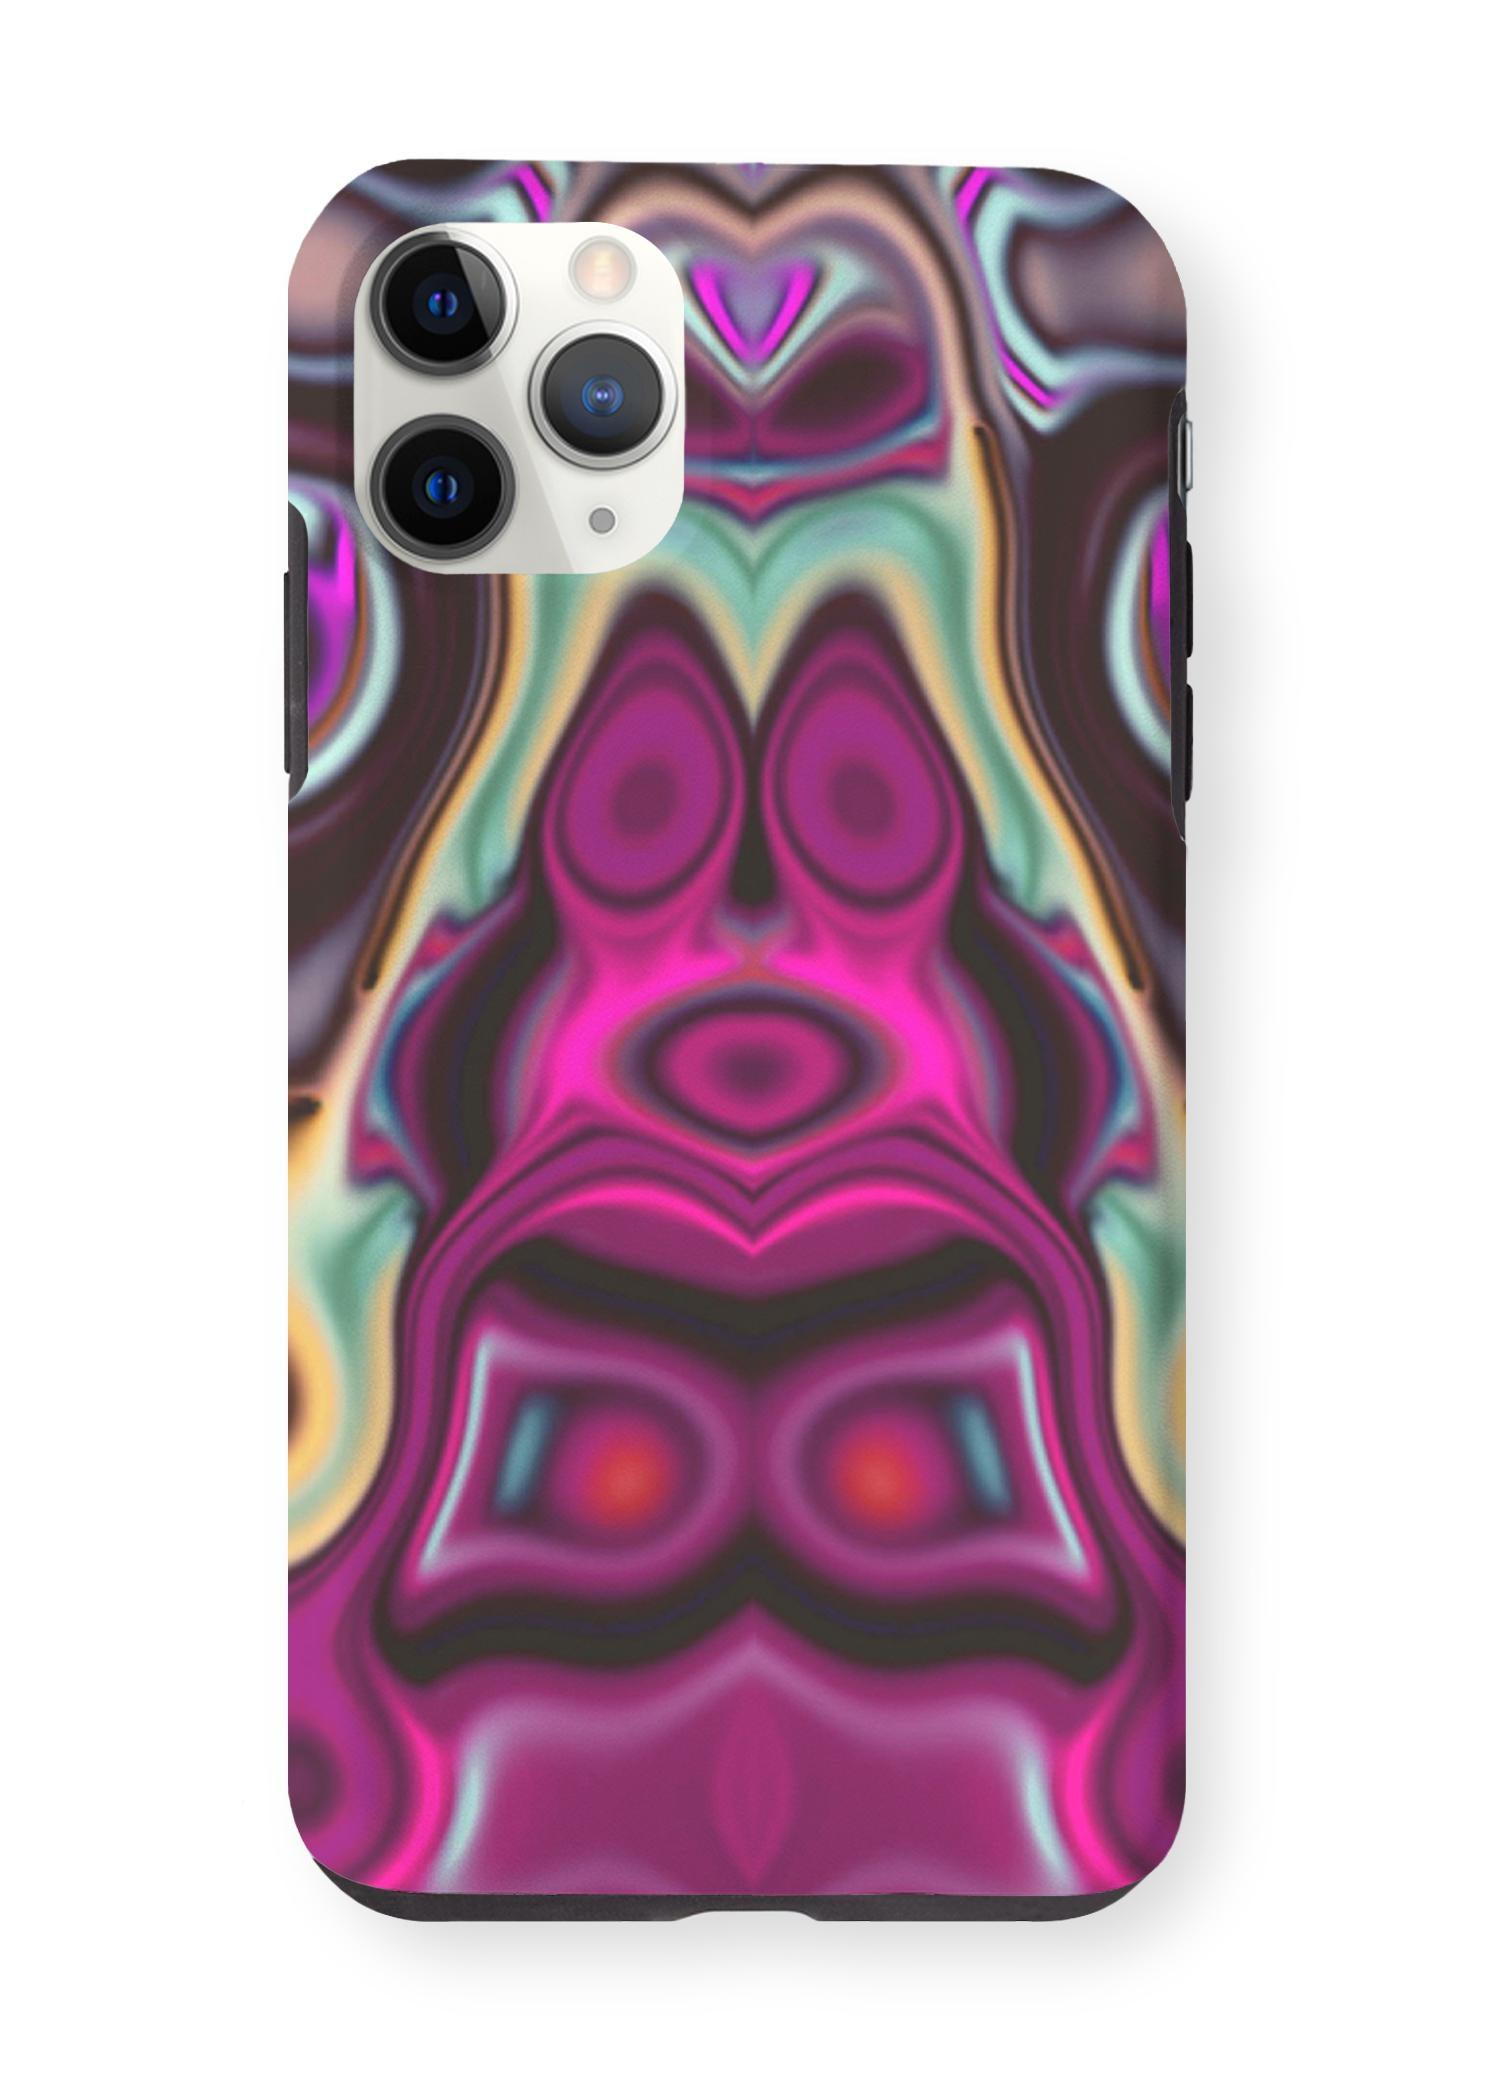 VIDA iPhone Case - Fashion Circles 7 by VIDA Original Artist  - Size: iPhone 11 Pro Max / Tough